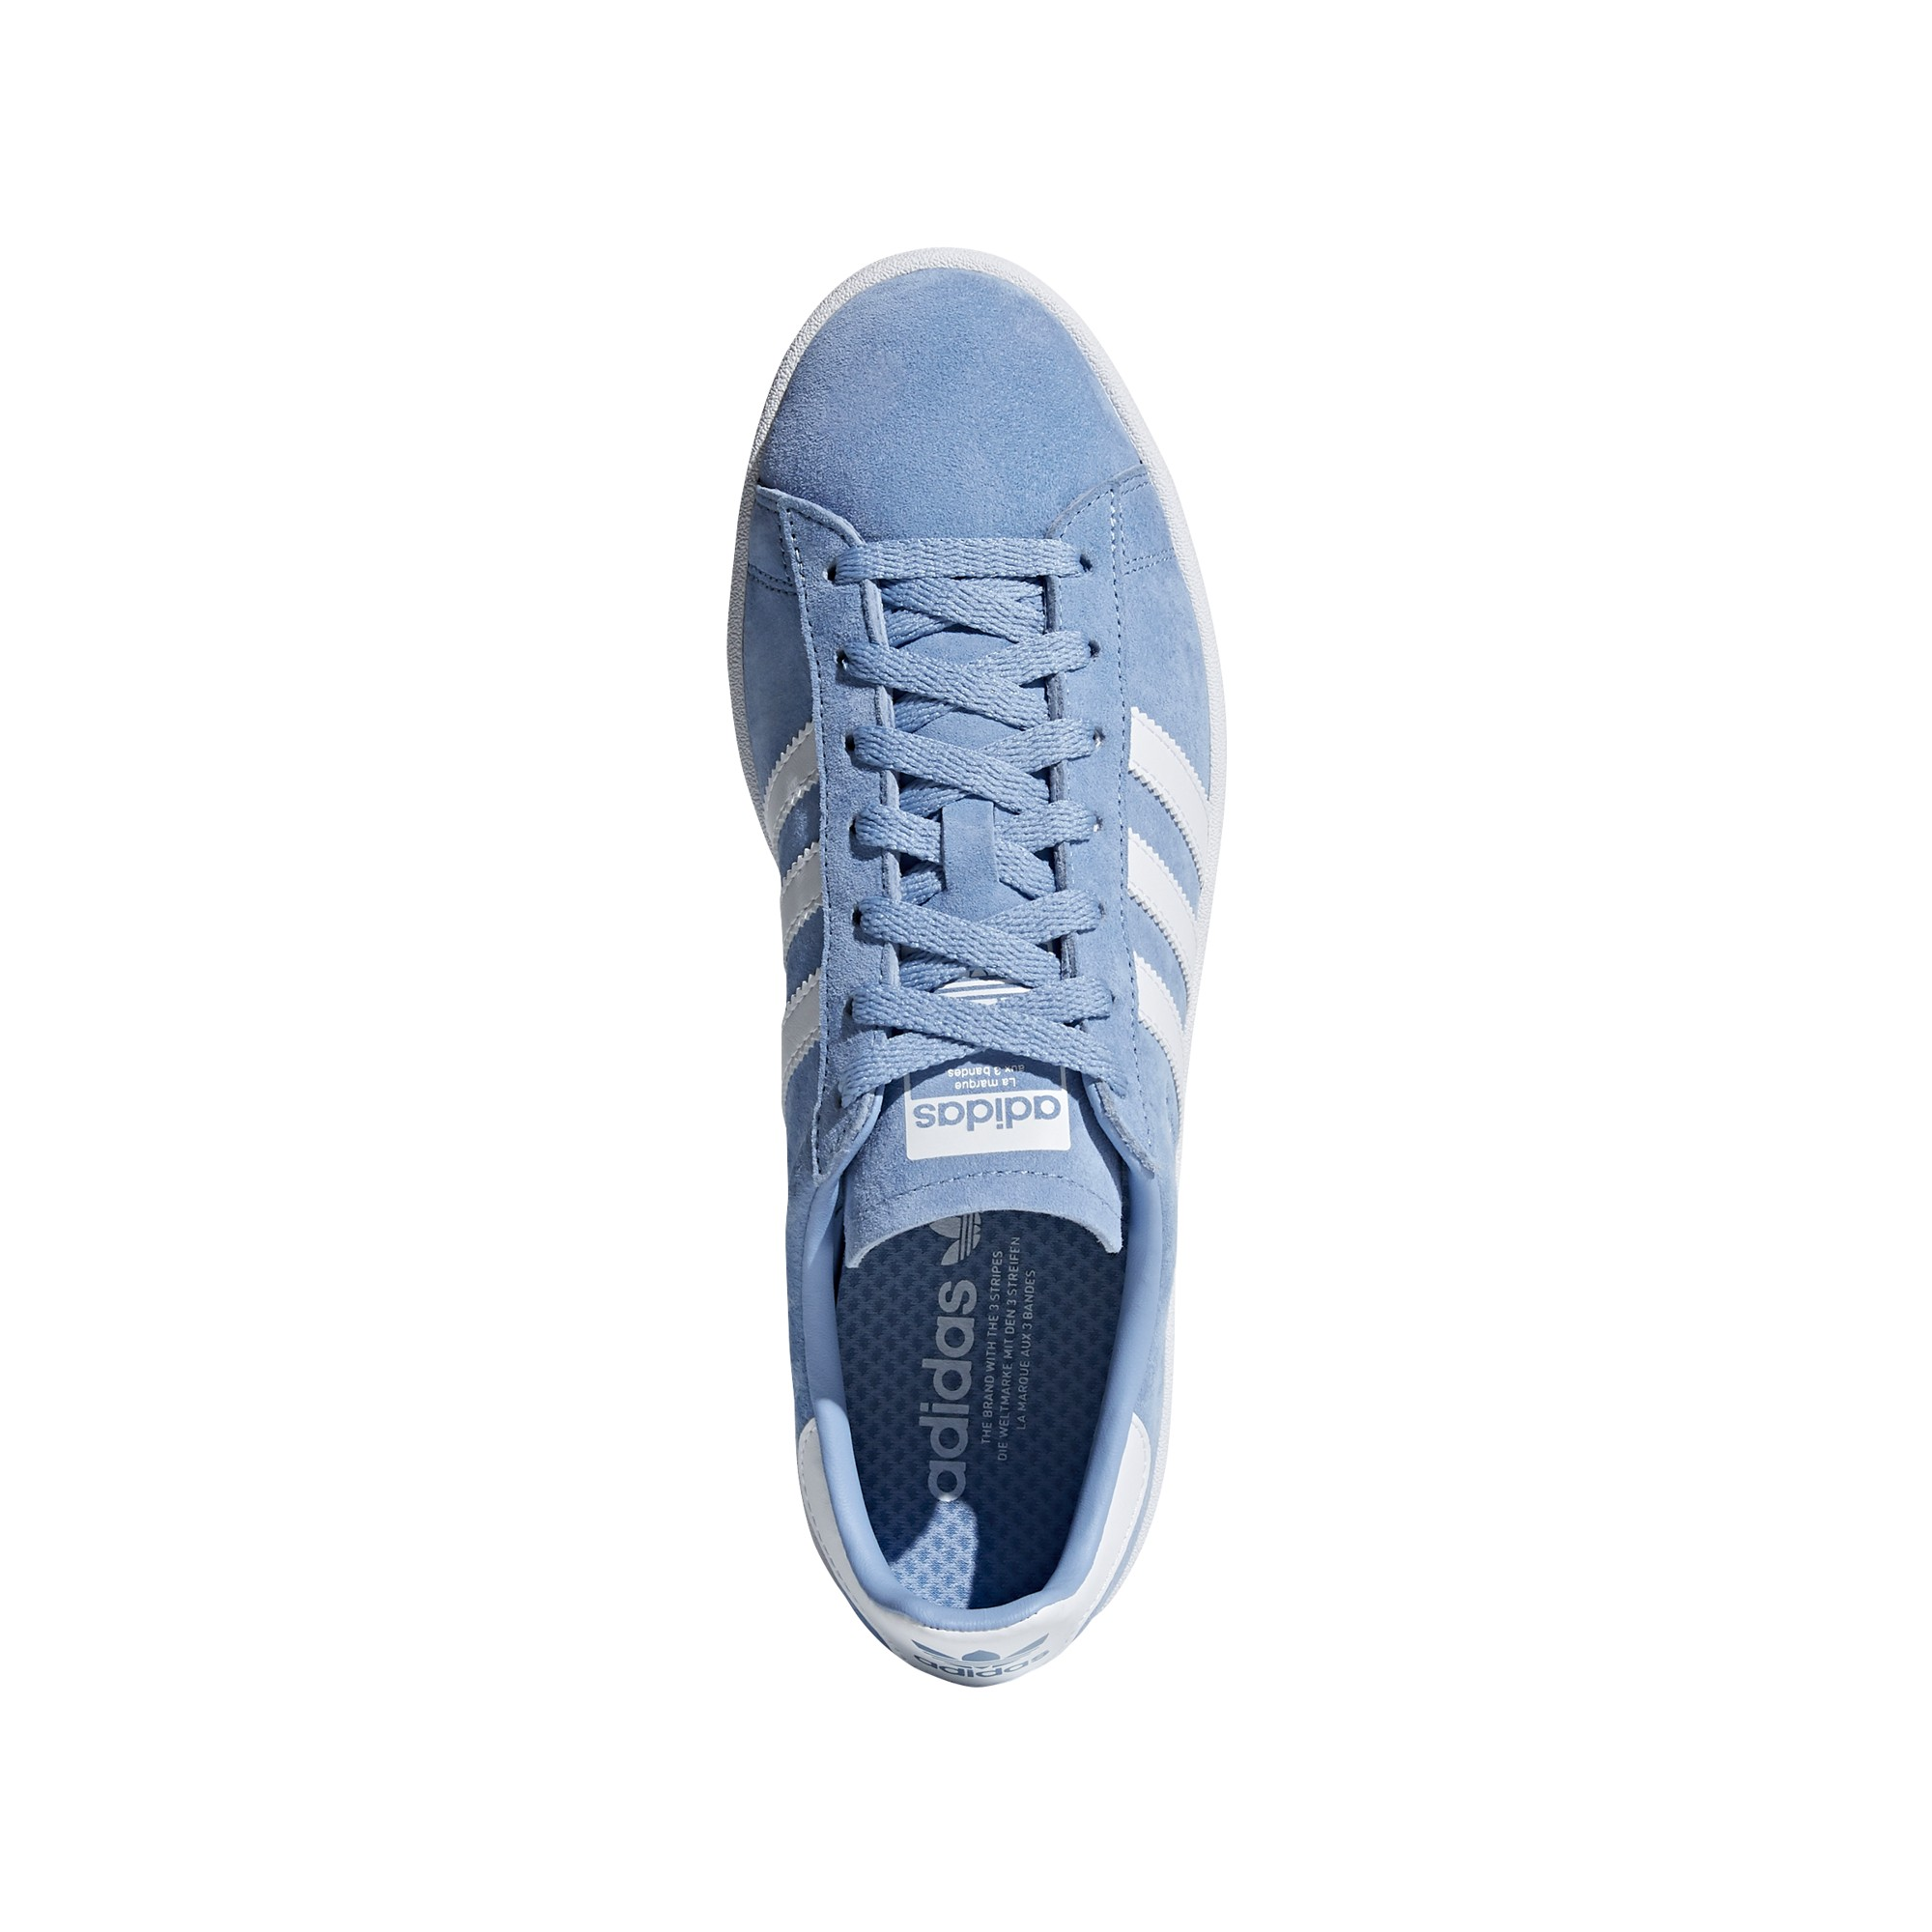 style ADIDAS donna campus azzurrobianco db0983 acquista su sport